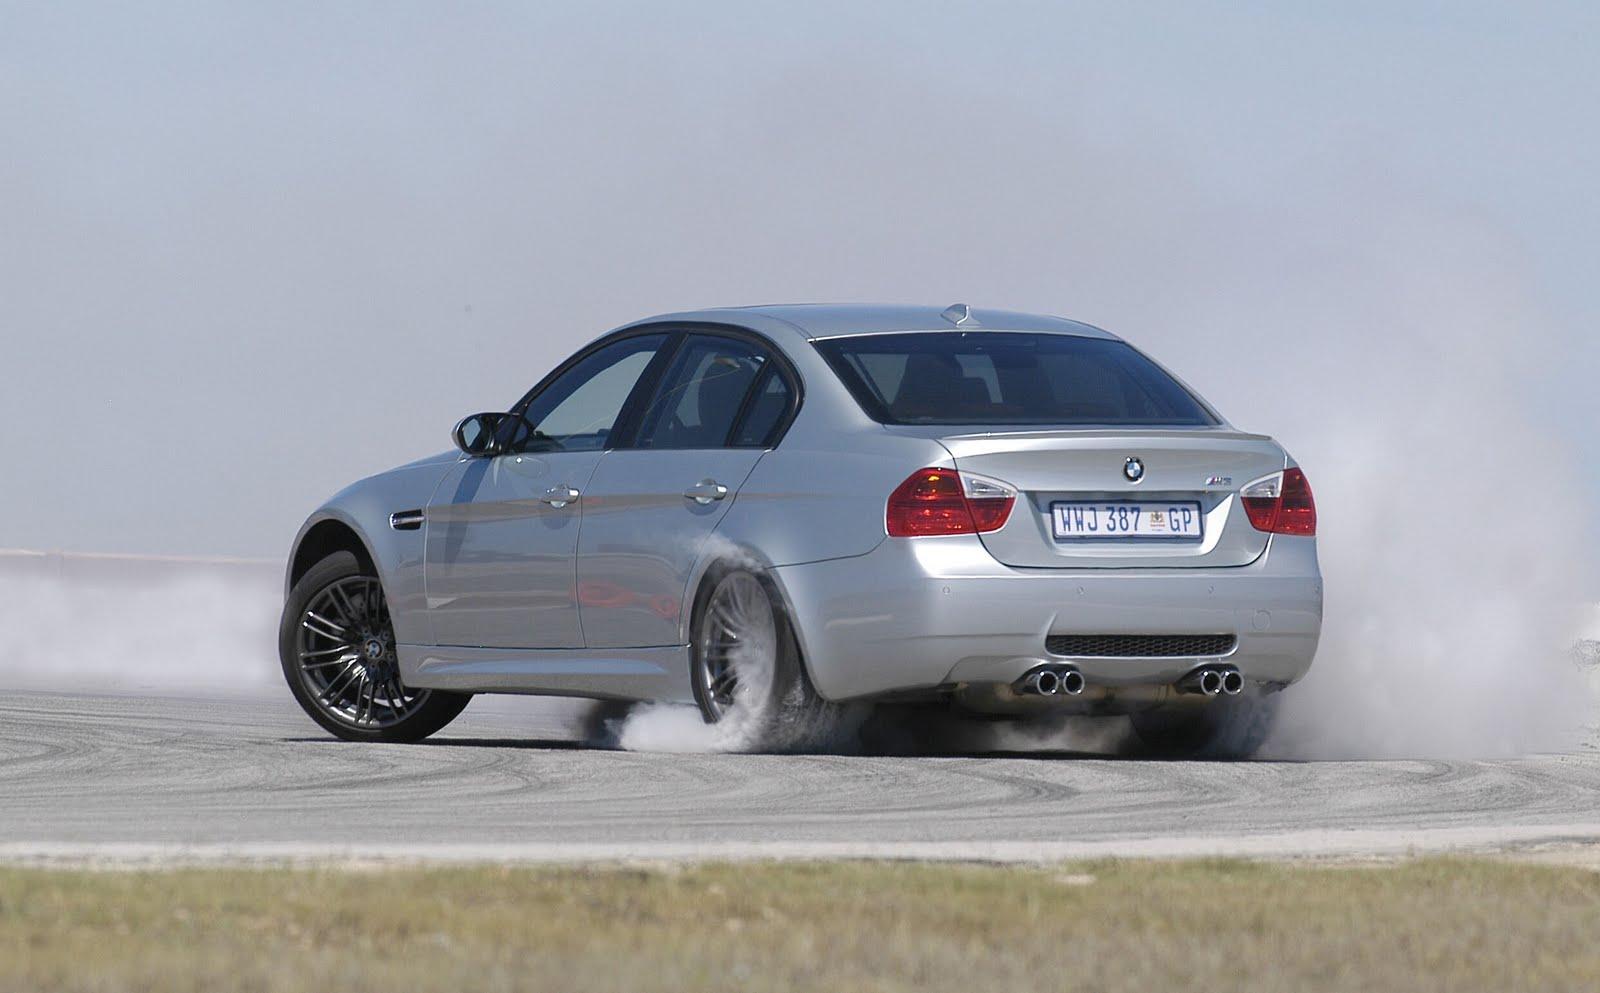 new car designs 2011 2020 next bmw m3 to sport a v6 engine. Black Bedroom Furniture Sets. Home Design Ideas